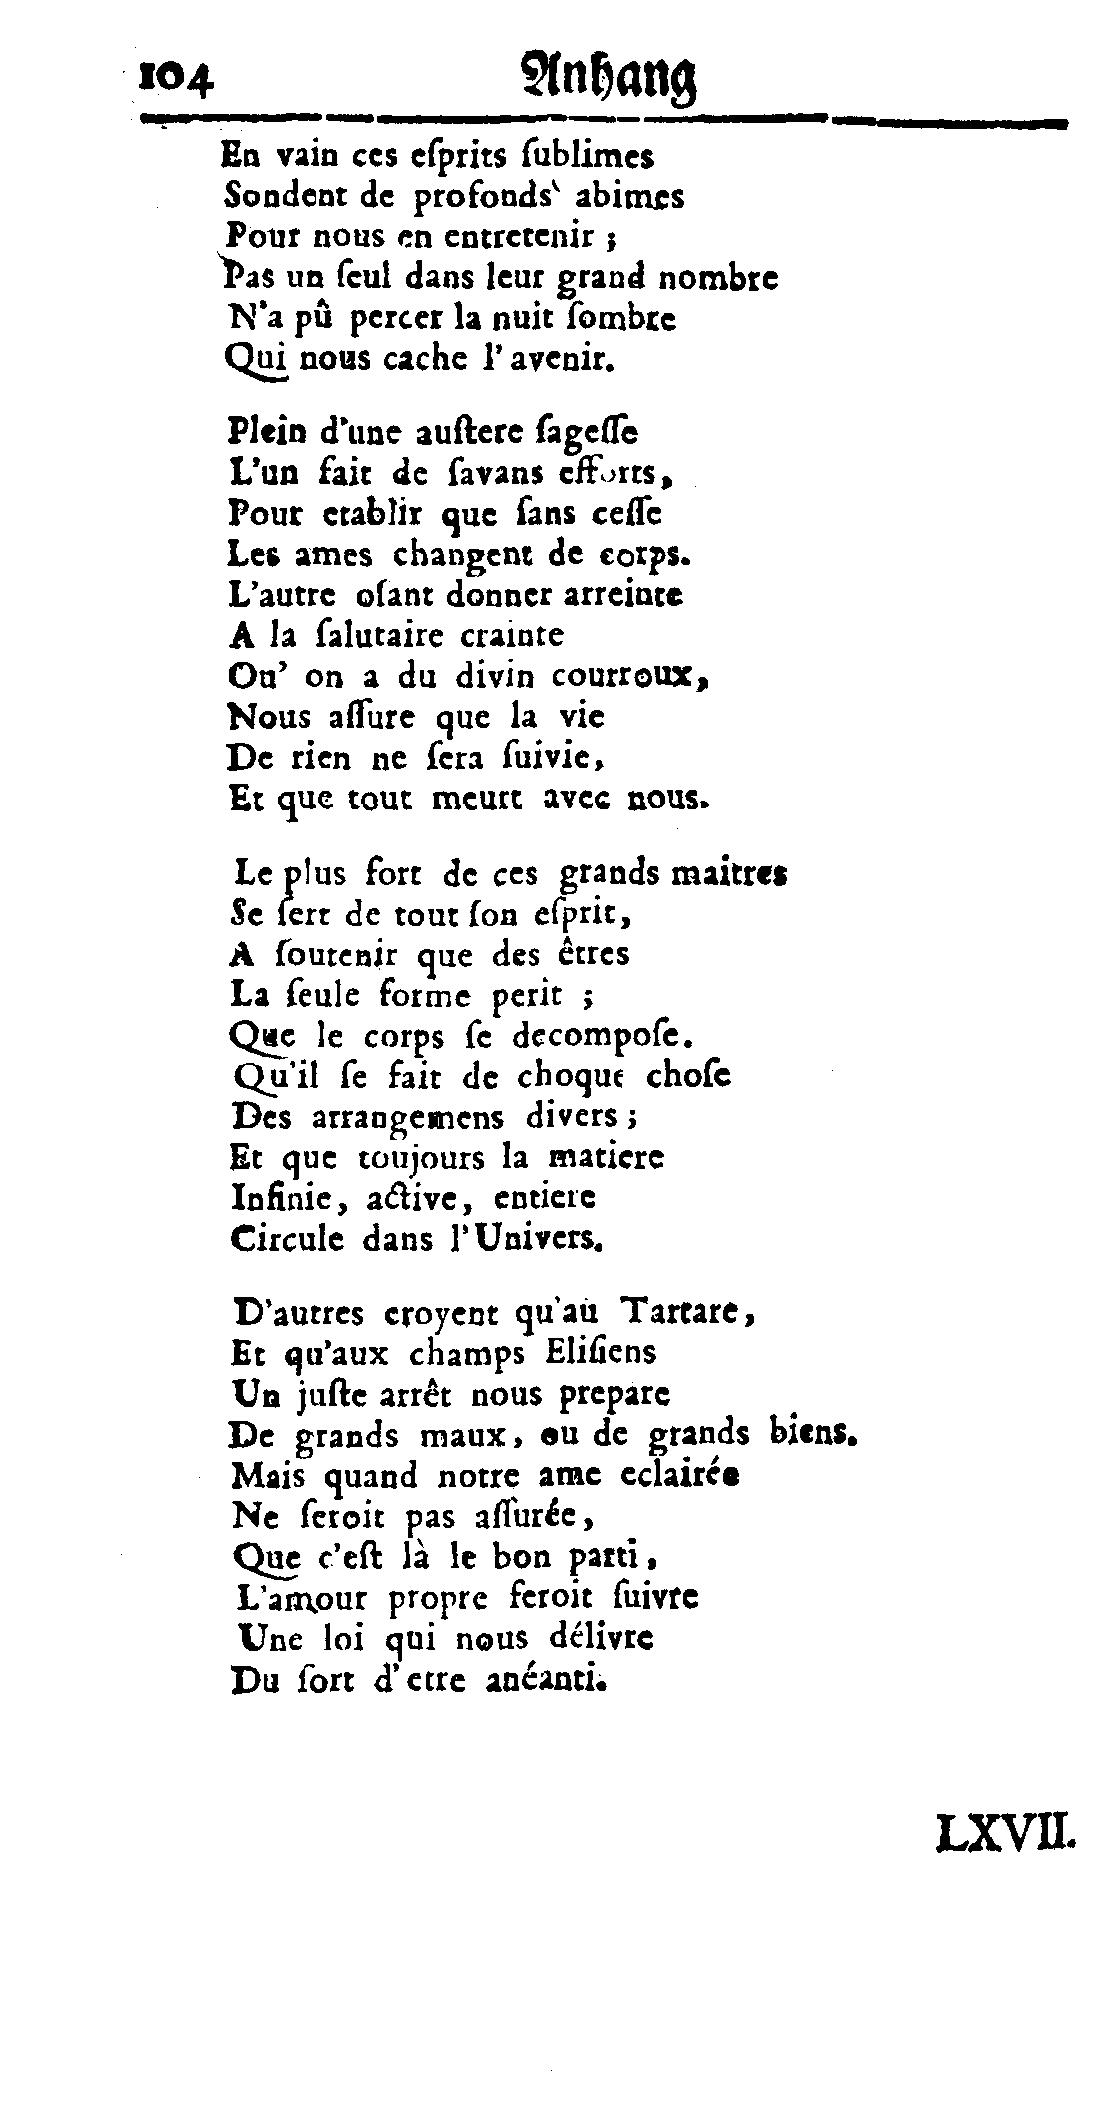 File:Galante Poetinnen 2104.png - Wikimedia Commons